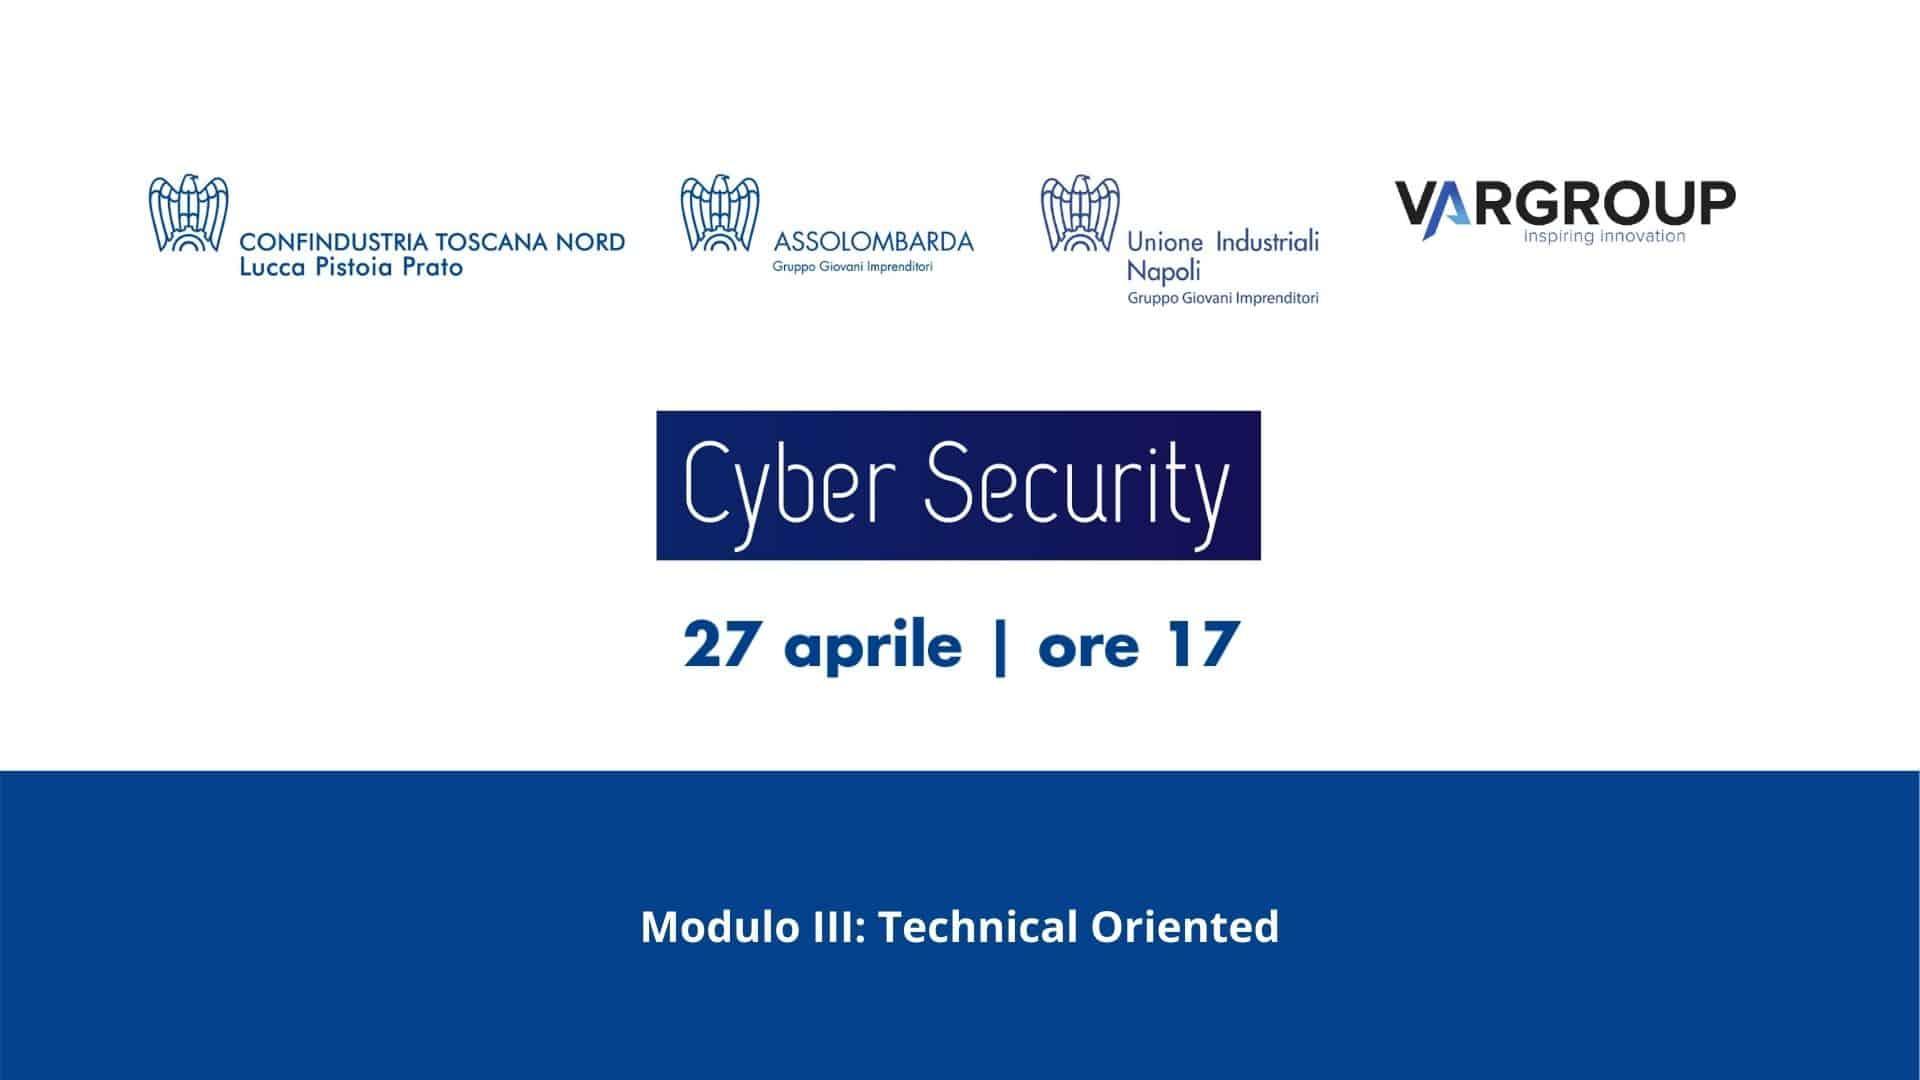 Cyber security Modulo III: Technical Oriented